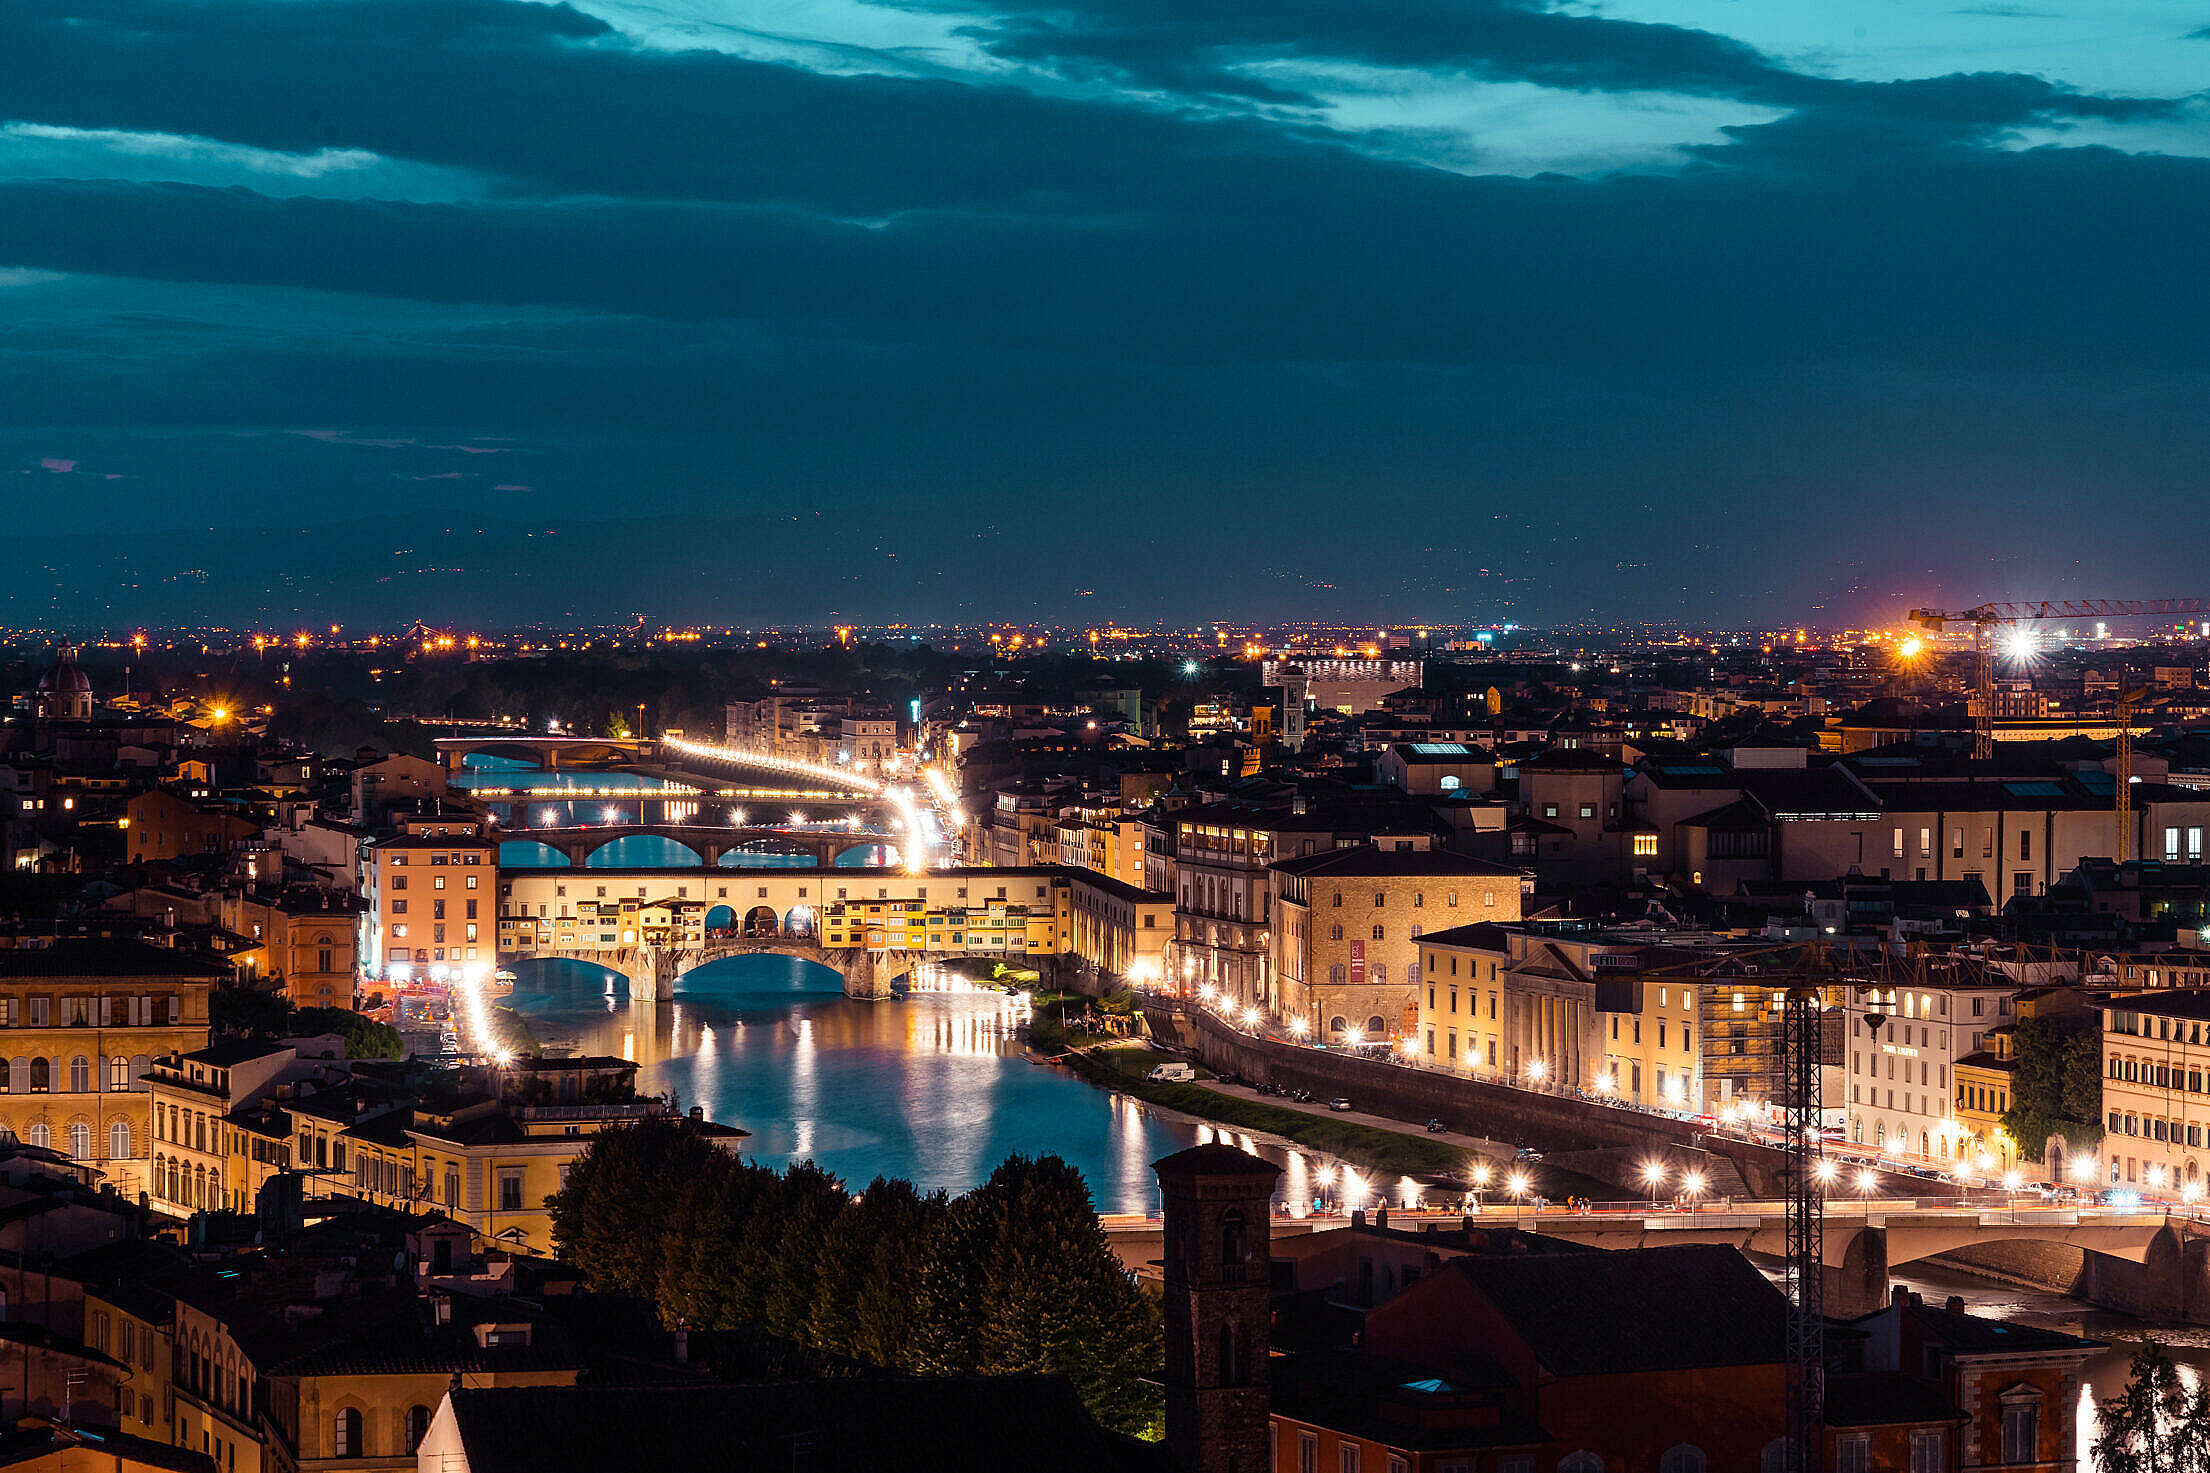 Ponte Vecchio on Arno River at Night, Florence, Italy Free Stock Photo